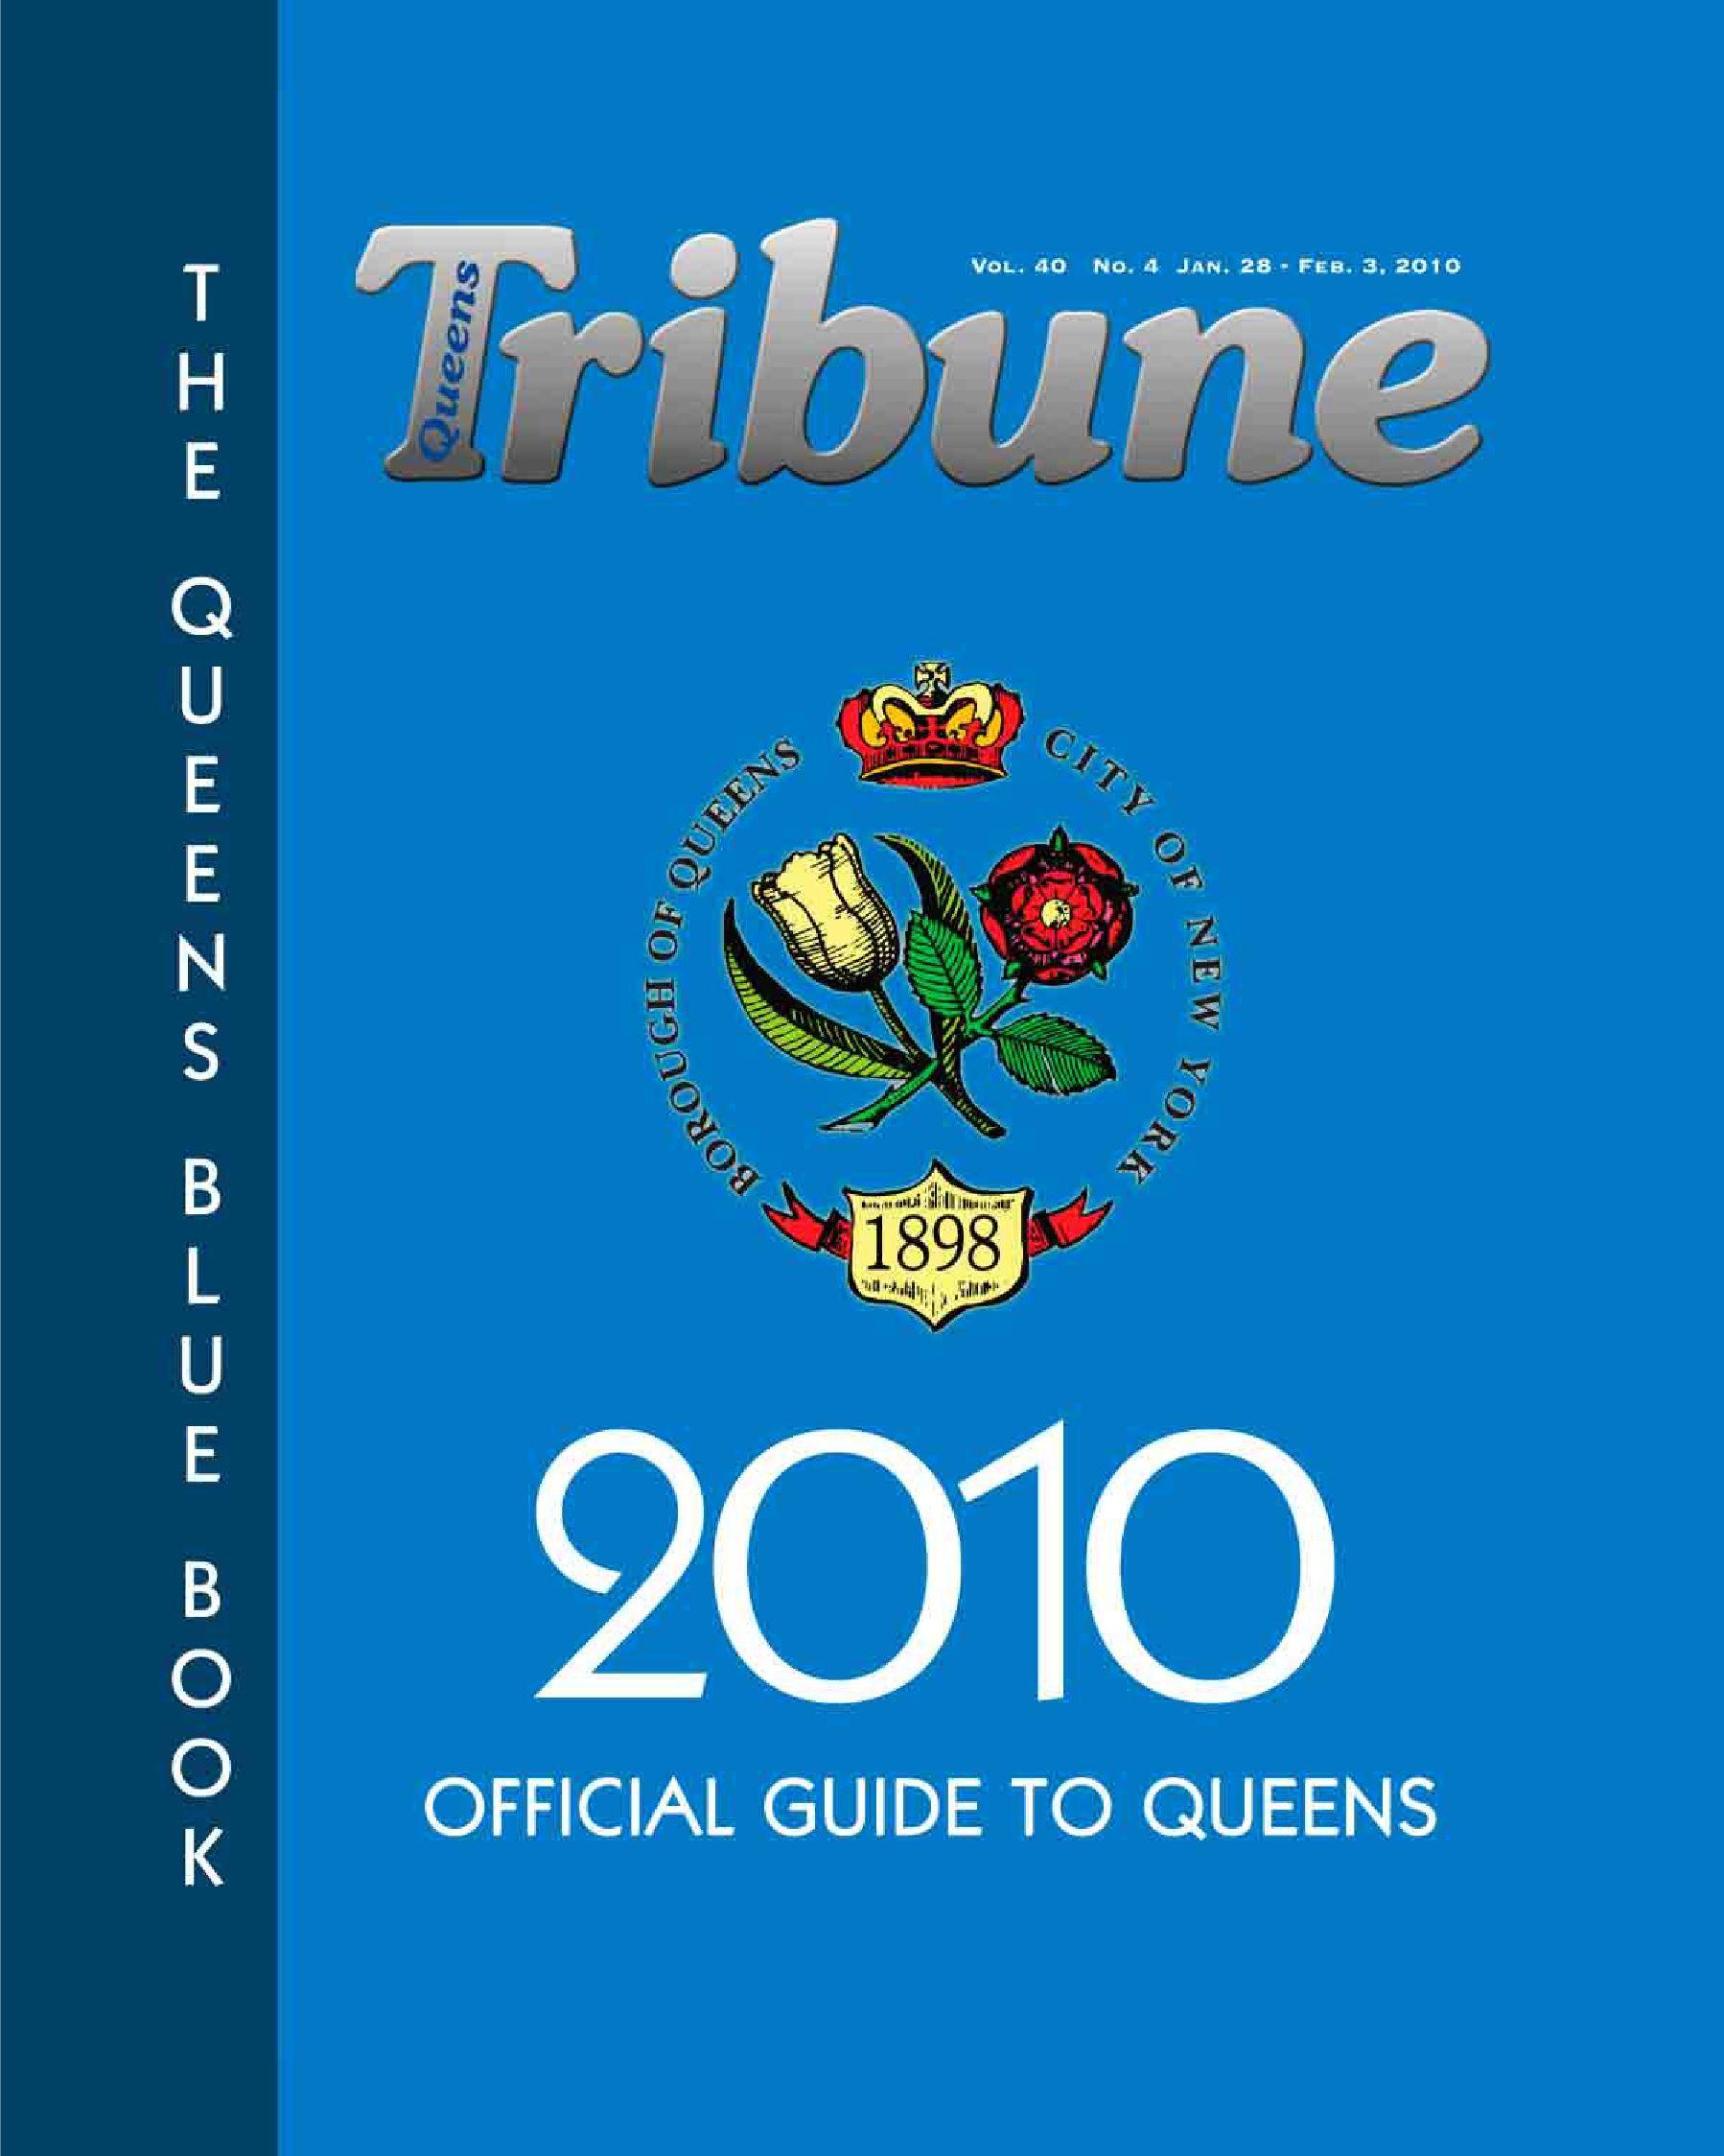 Queens Tribune by Michael Nussbaum - issuu